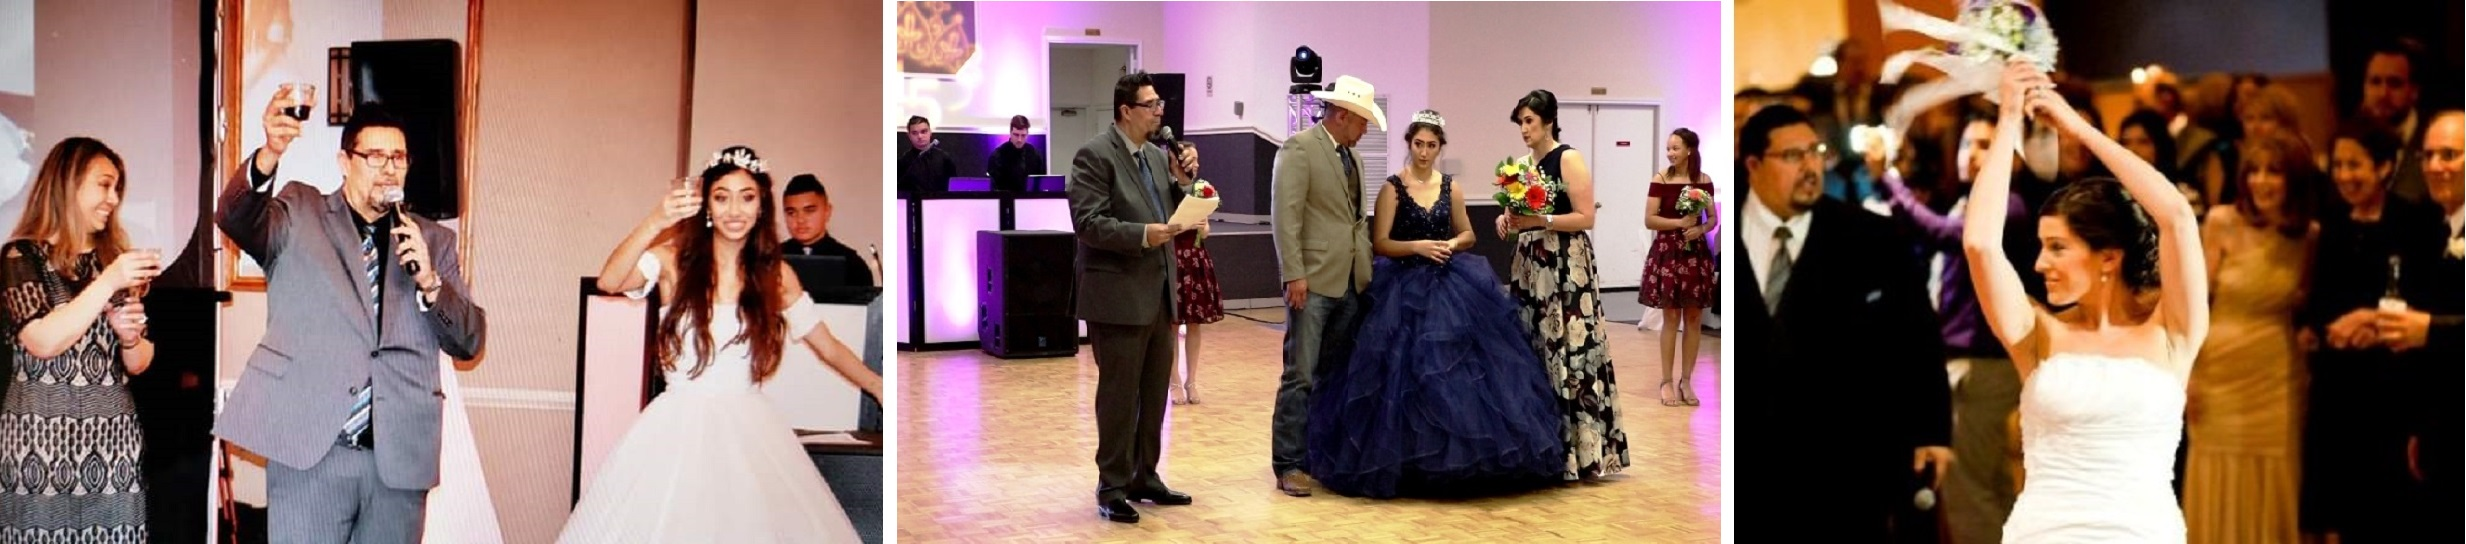 Houston Wedding DJ, Wedding DJs in Houston, Bilingual Master of Ceremony, Latino Master of Ceremony, Spanish Master of Ceremony, Hispanic Master of Ceremony, Sonido, DJ Sammy de Houston, Awesome Event Pros, Awesome Music Entertainment, AME Djs, Maestro de Ceremonia, Boda, Quinceañera